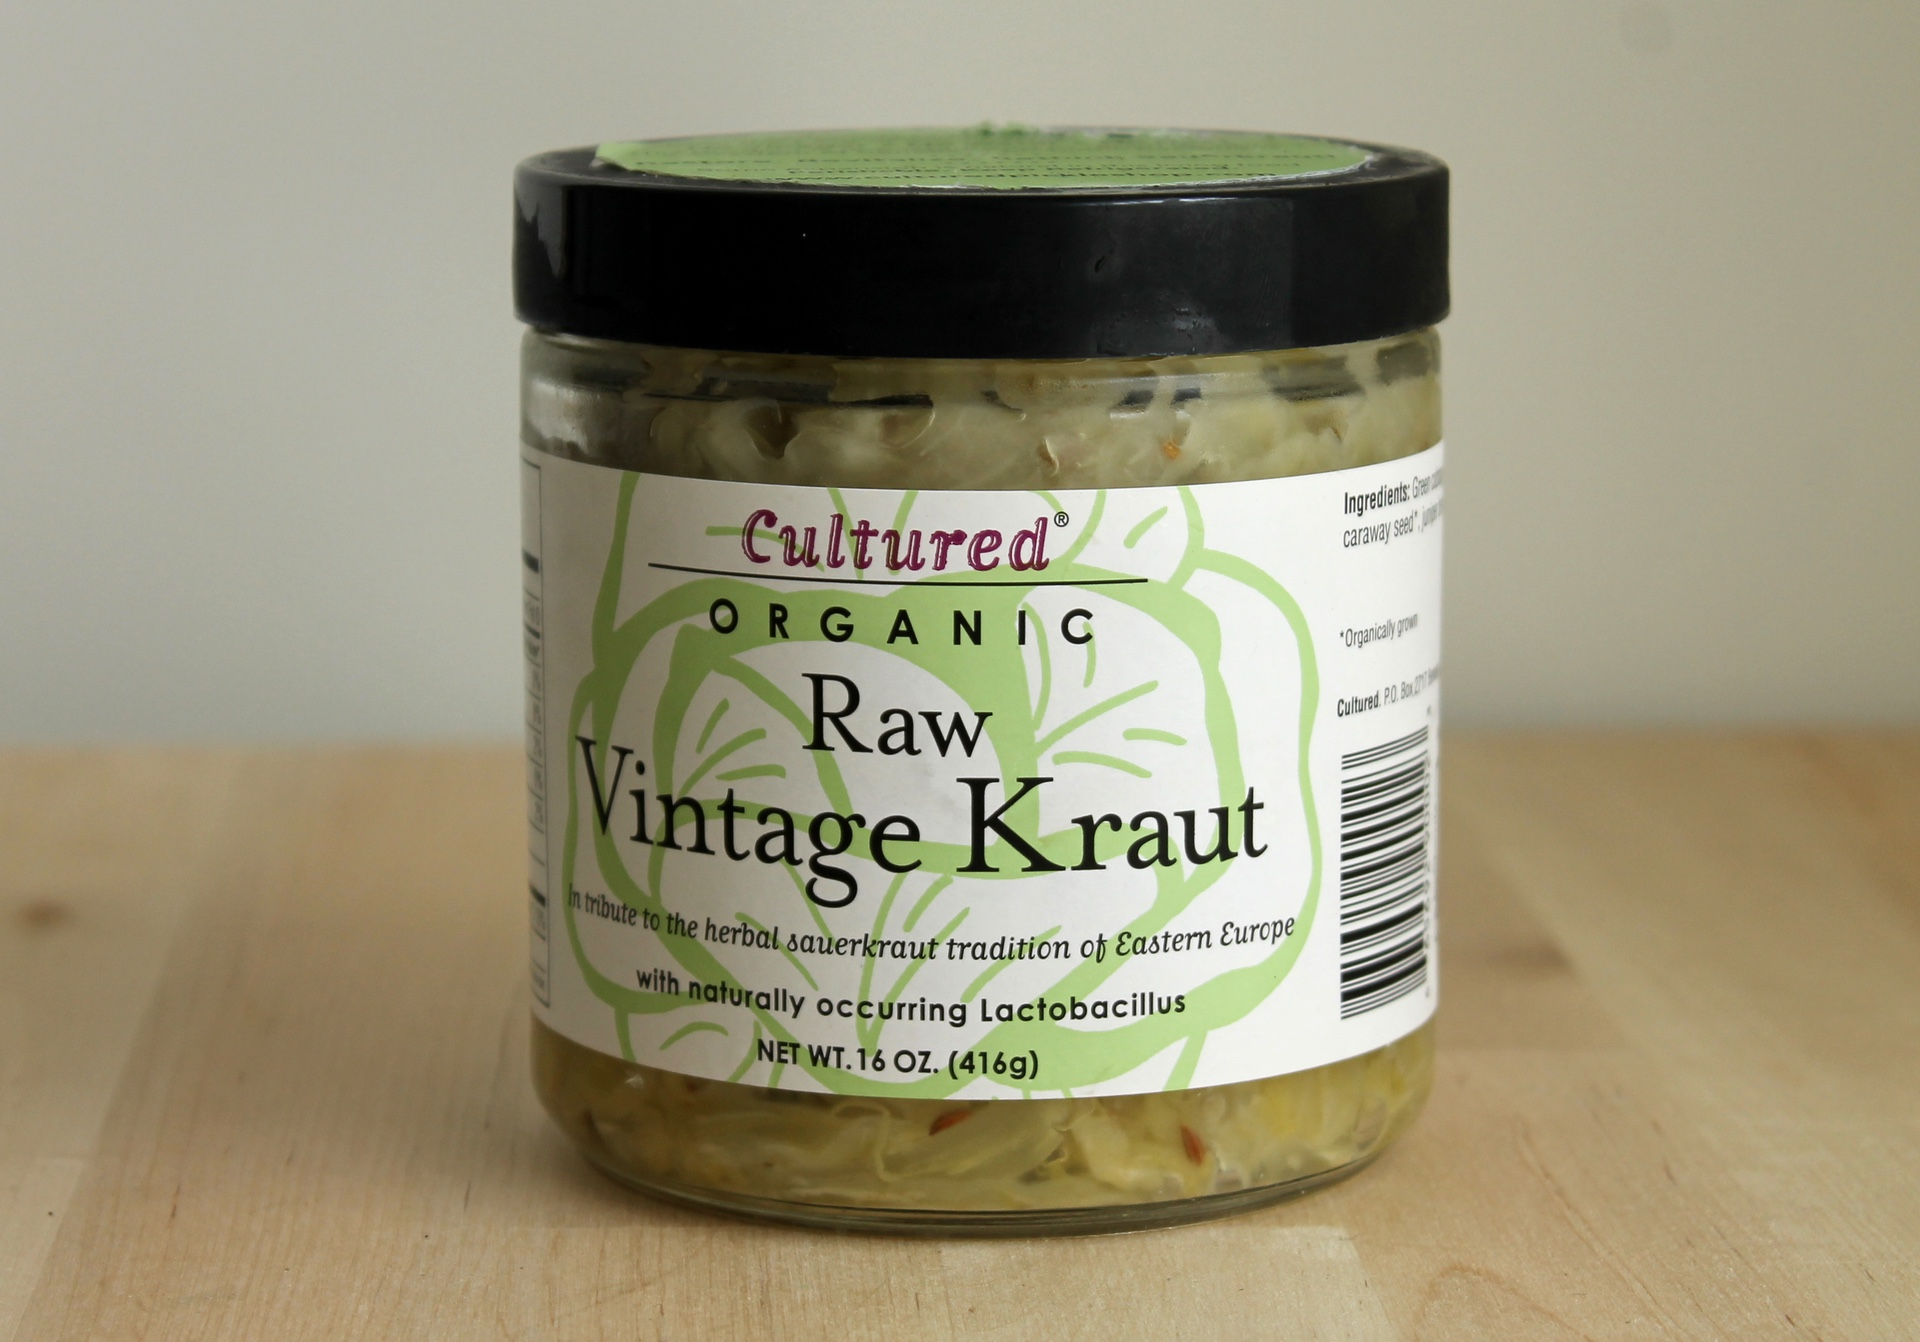 Cultured Organic sauerkraut.